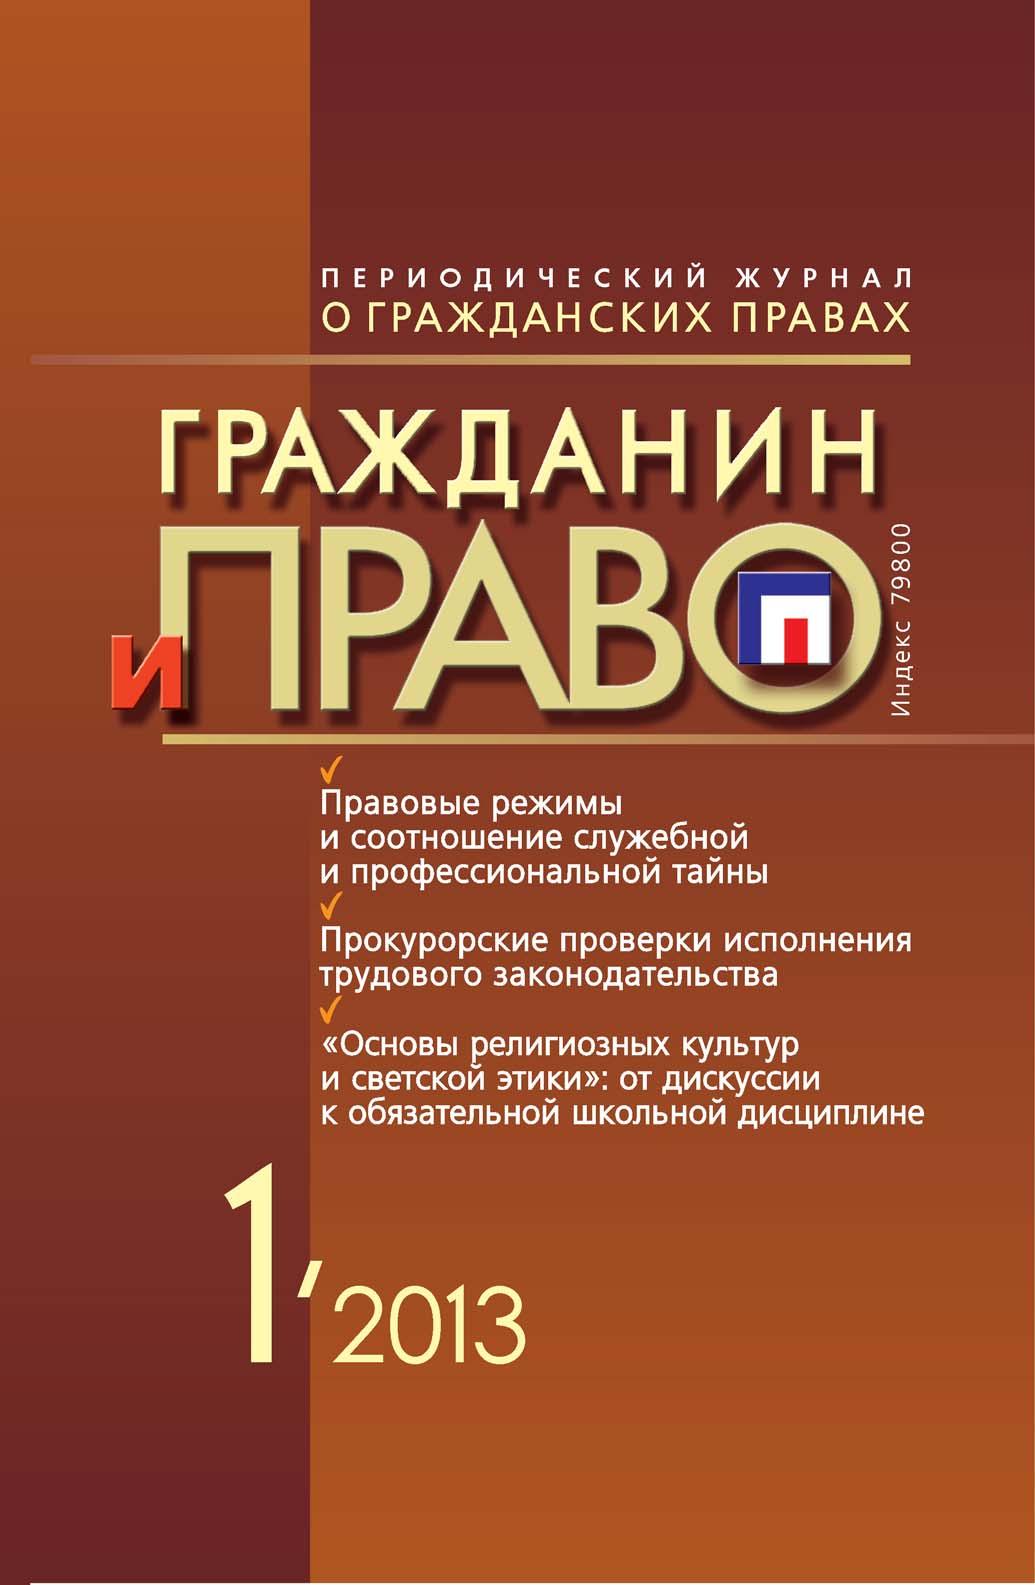 Гражданин и право №01/2013